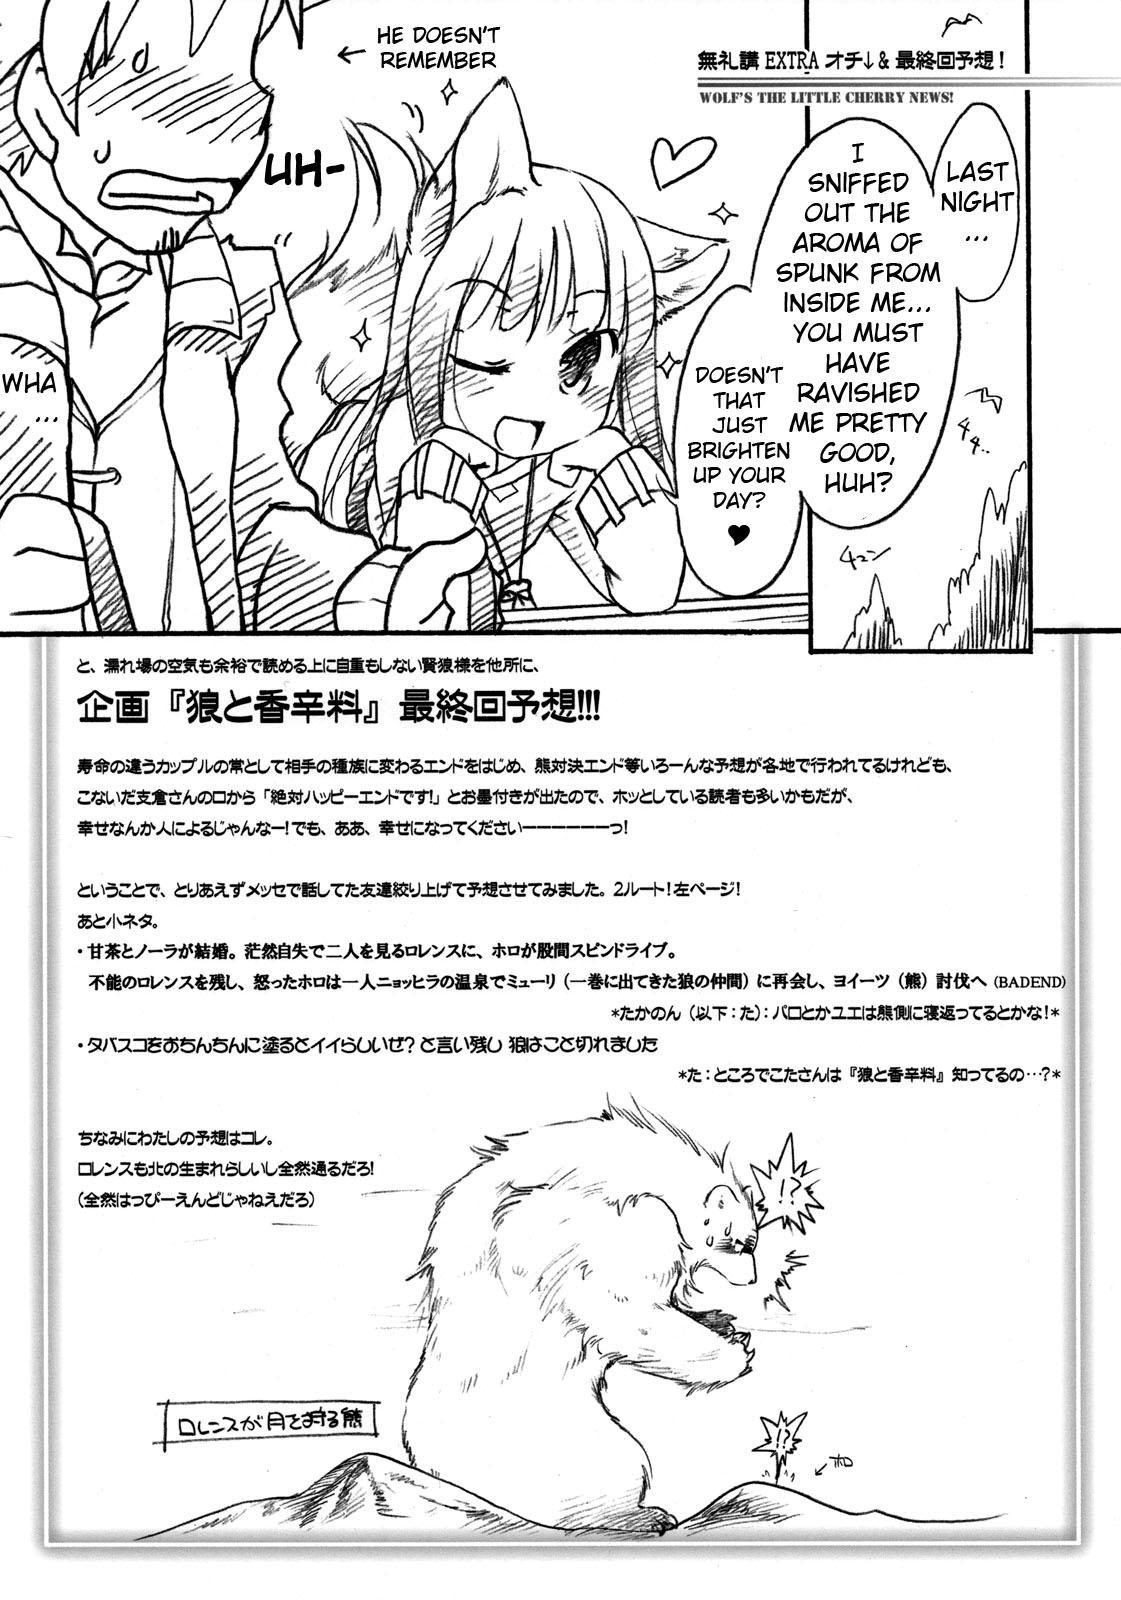 (COMIC1☆2) [Hina prin (Ikuta Takanon)] Ookami no Chotto H na Hanashi [Wolf and a Little Dirty Chat] (Ookami to Koushinryou [Spice and Wolf]) [English] ==Strange Companions== 8